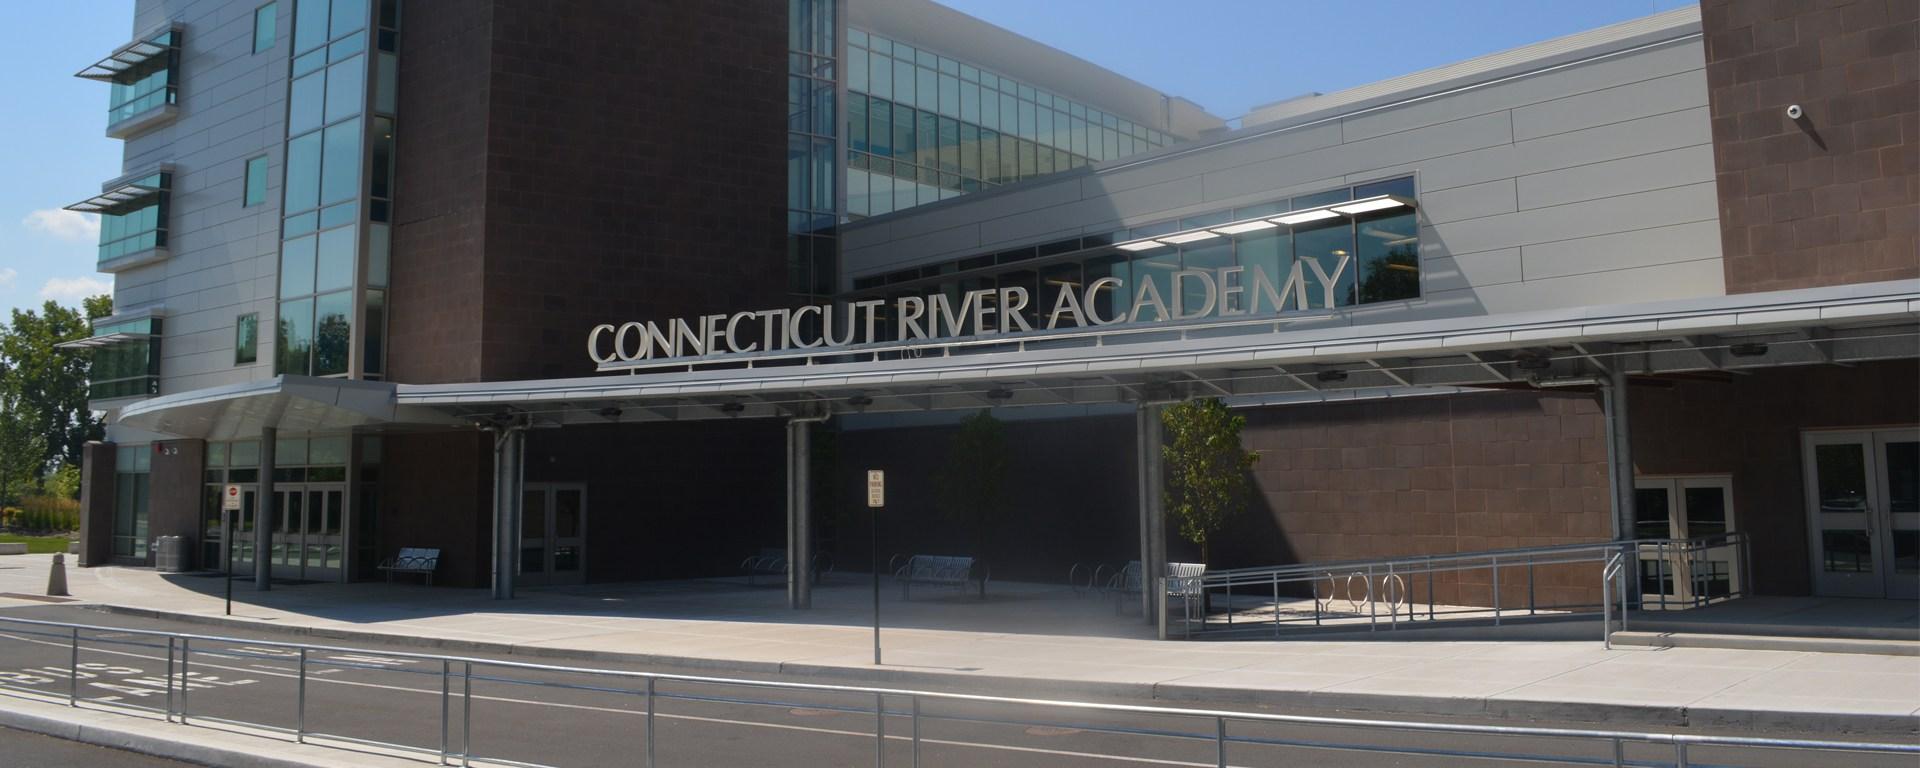 Connecticut River Academy Receives NEASC Accreditation